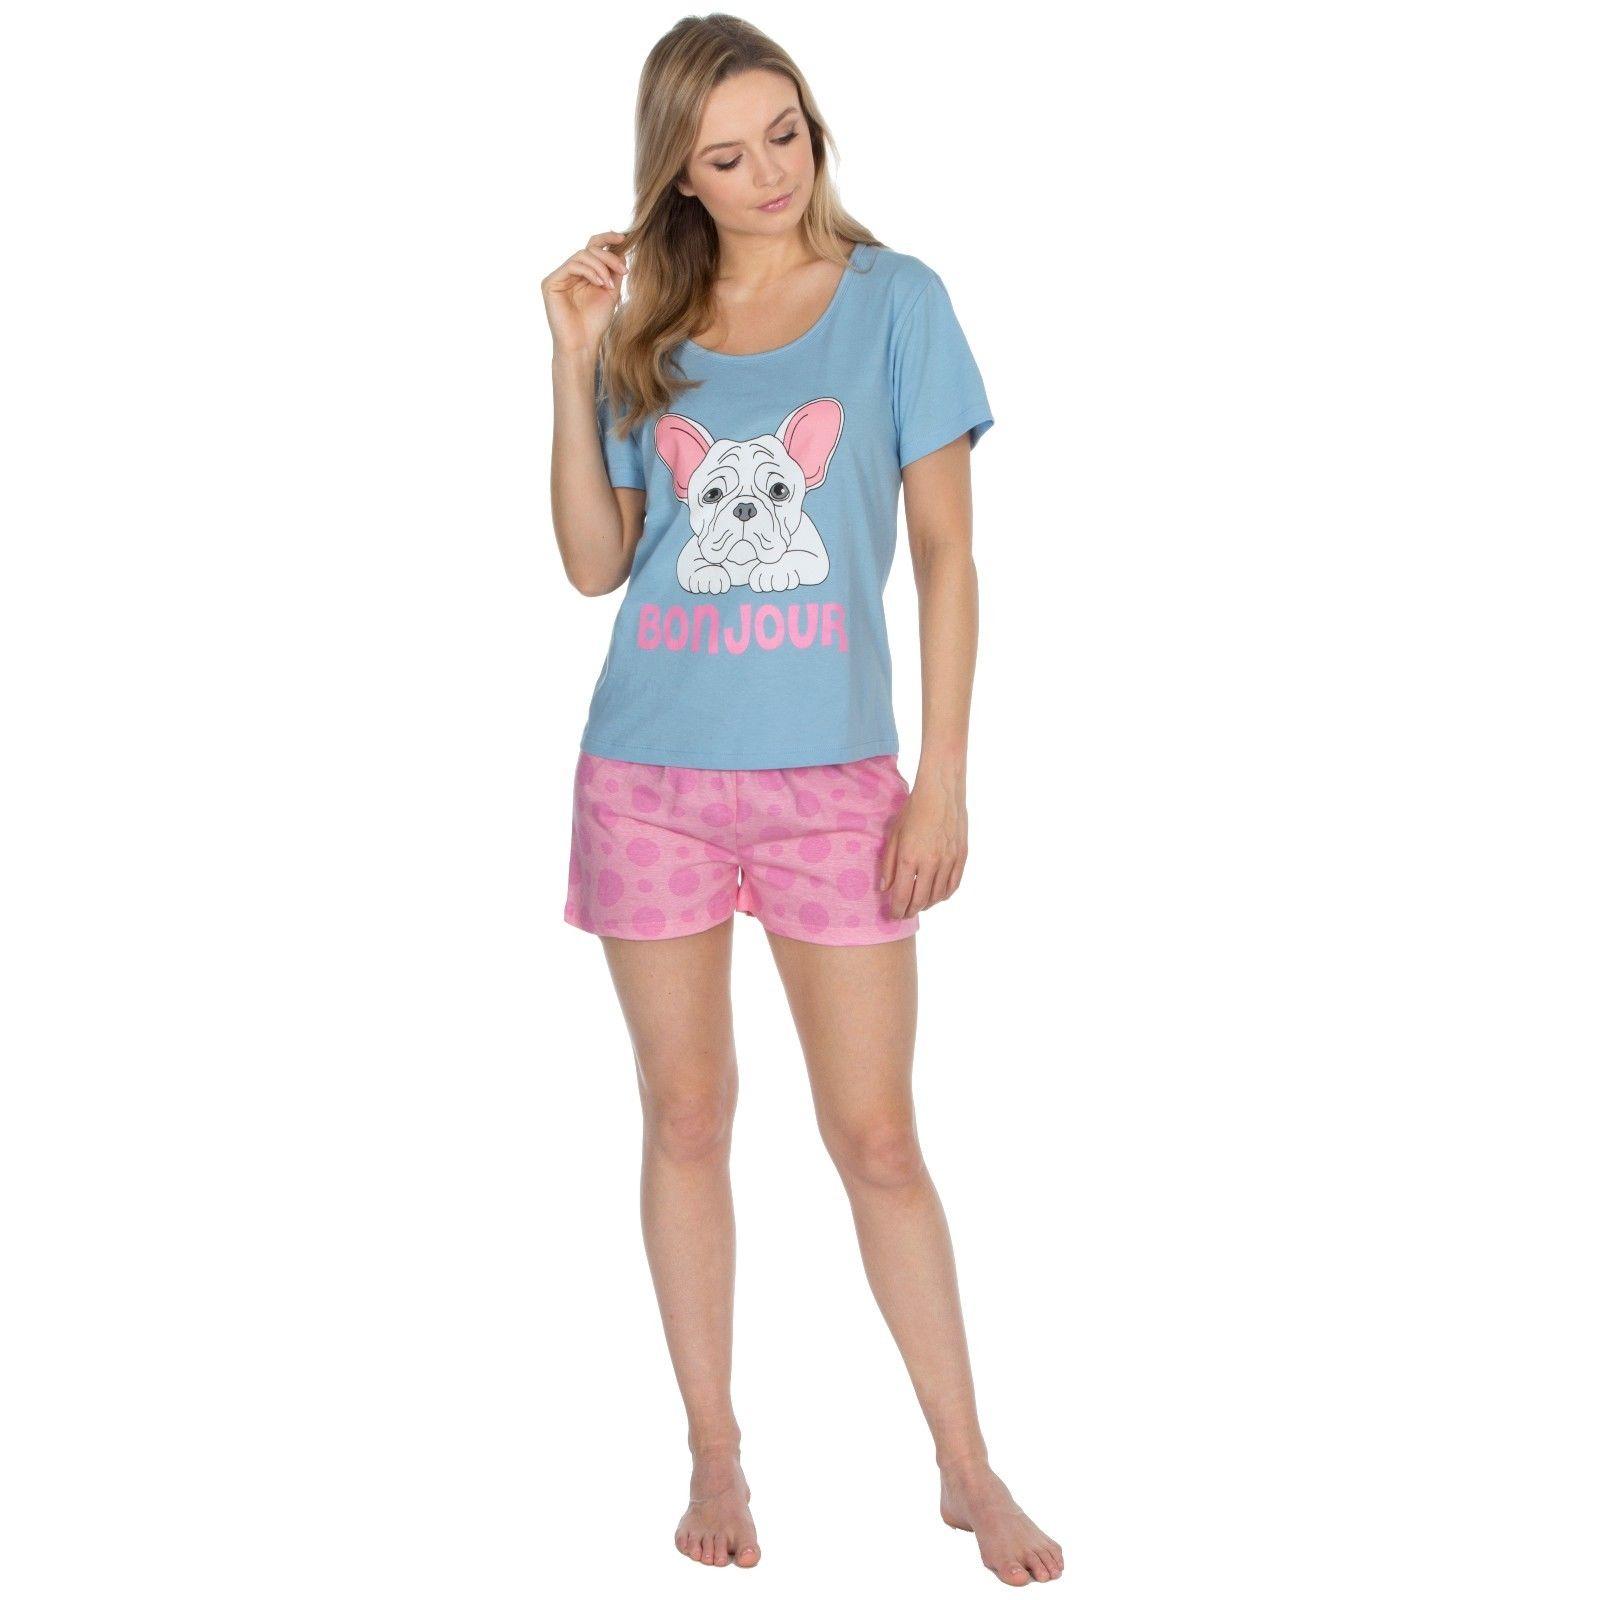 2a2492941b4e Womens Pyjamas Cotton Rich Pjs Loungewear By Forever Dreaming